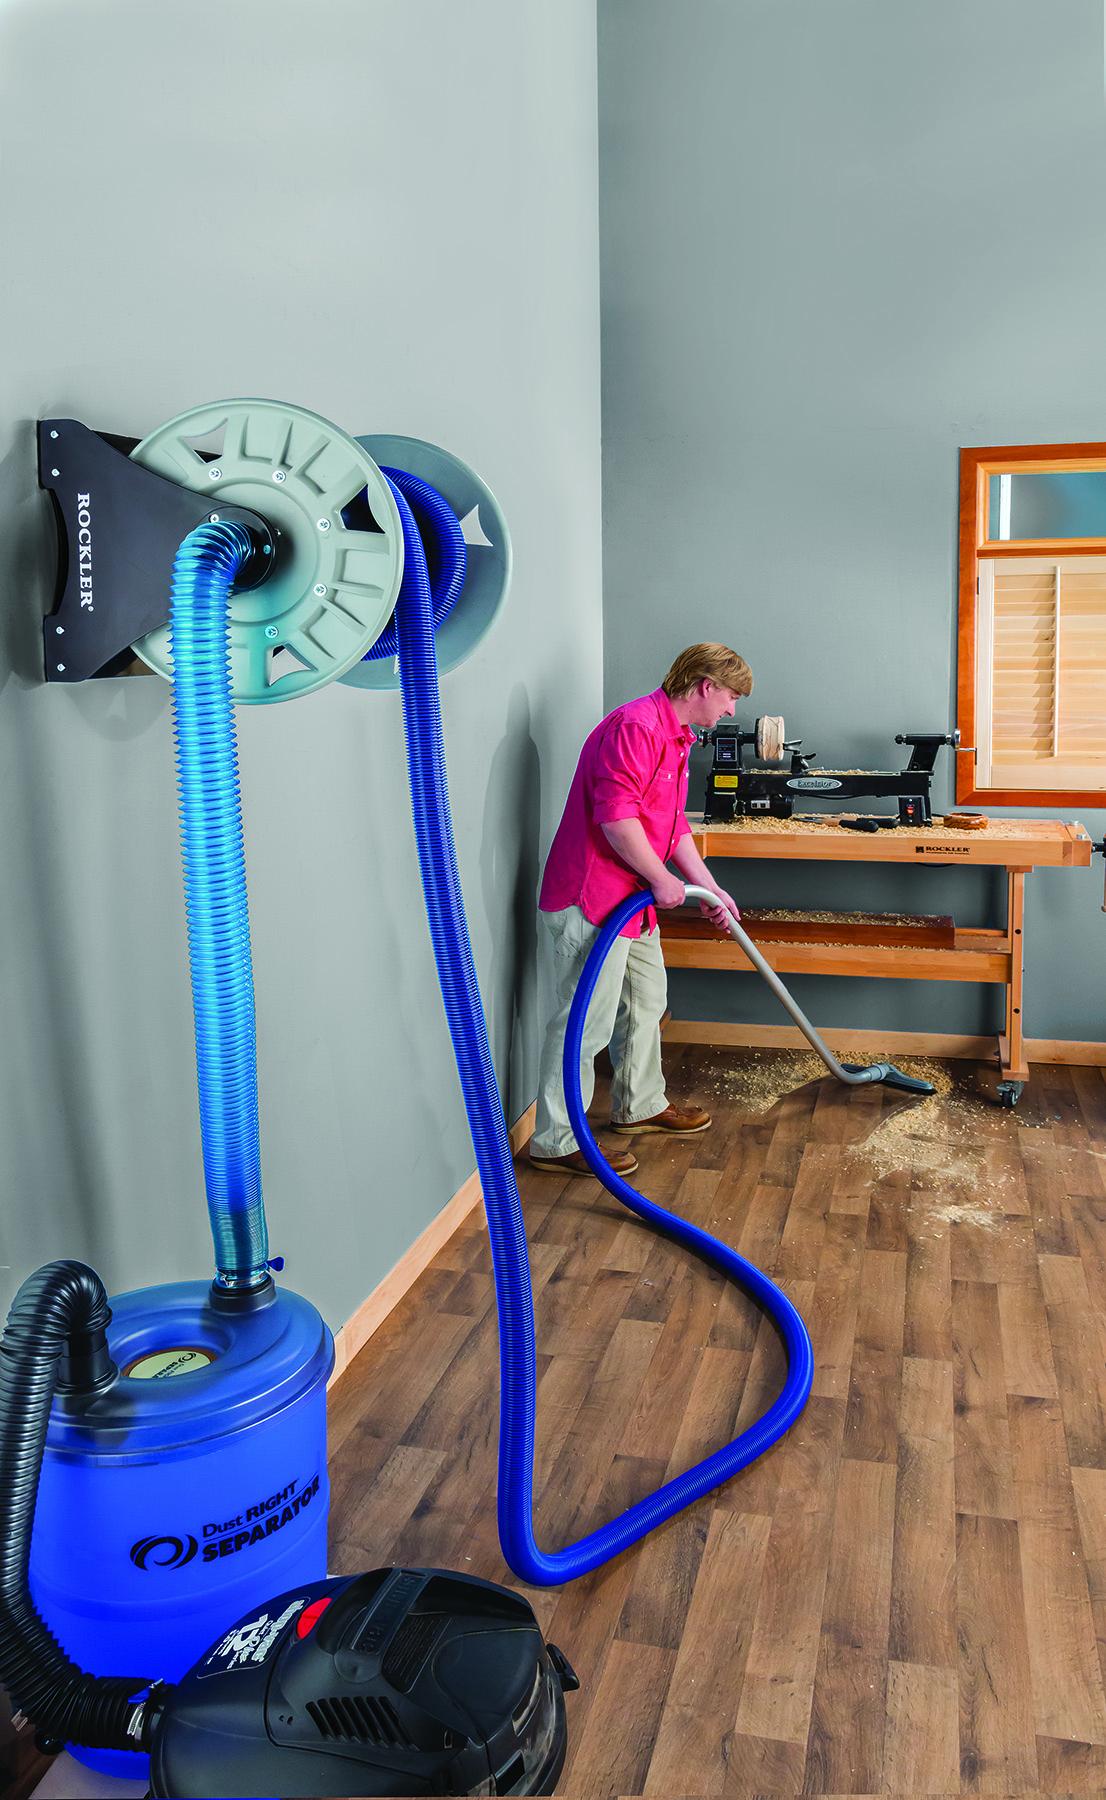 Rockler Introduces Shop Vacuum Hose Reel Easily Unwinds